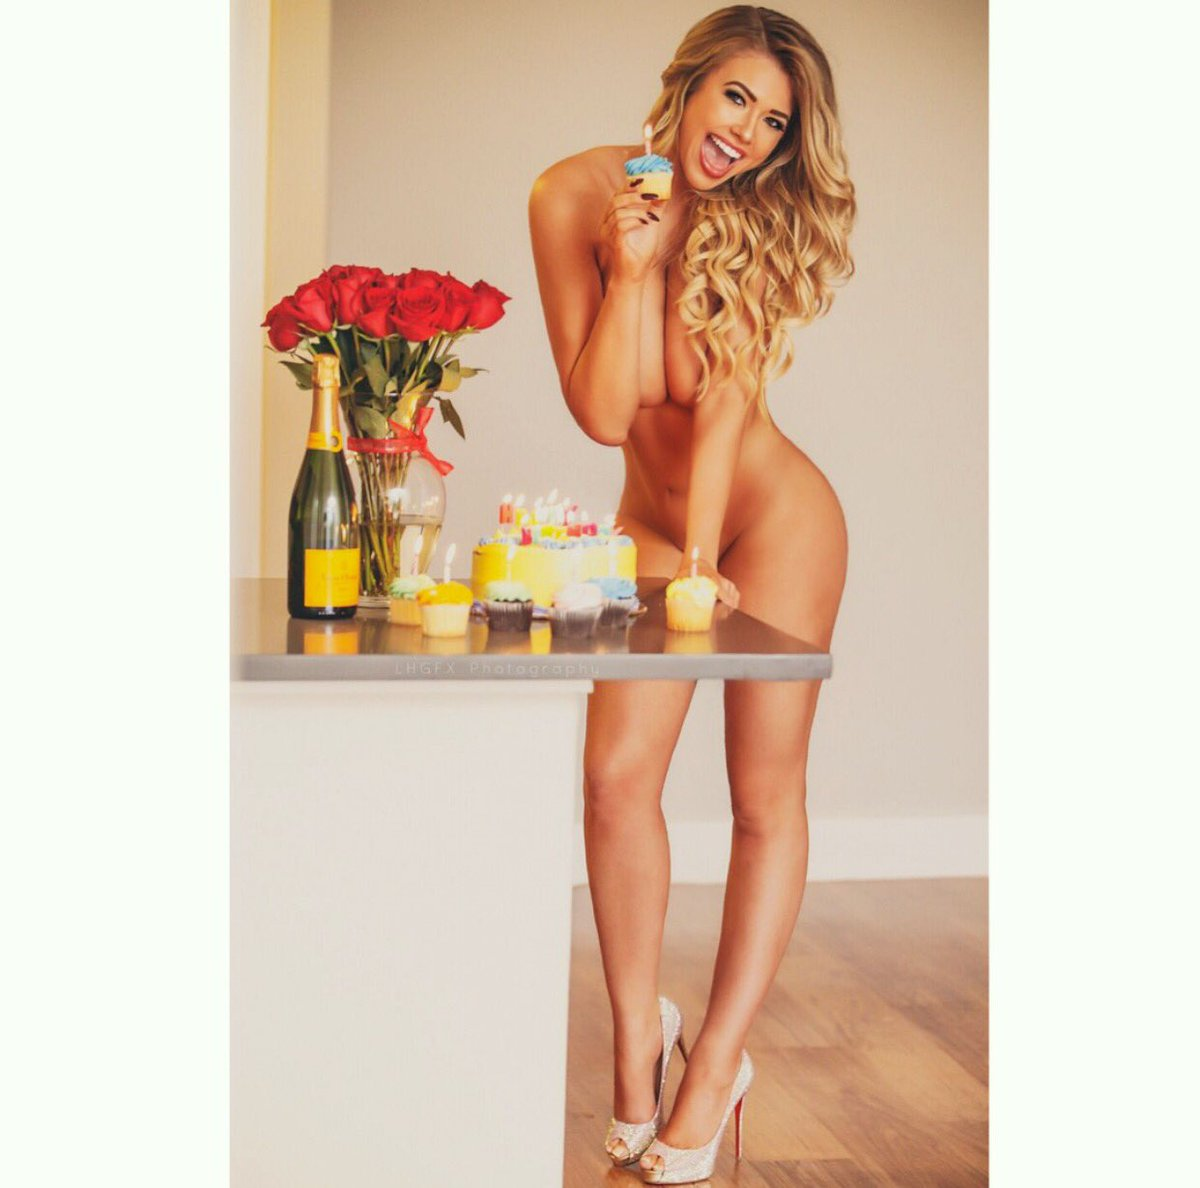 Paige - WWE Nude,Cindy Bastien. 2018-2019 celebrityes photos leaks! Porn archive Ariel winter learns about angles in bikini,Gisele bunchen by mert alas marcus piggott